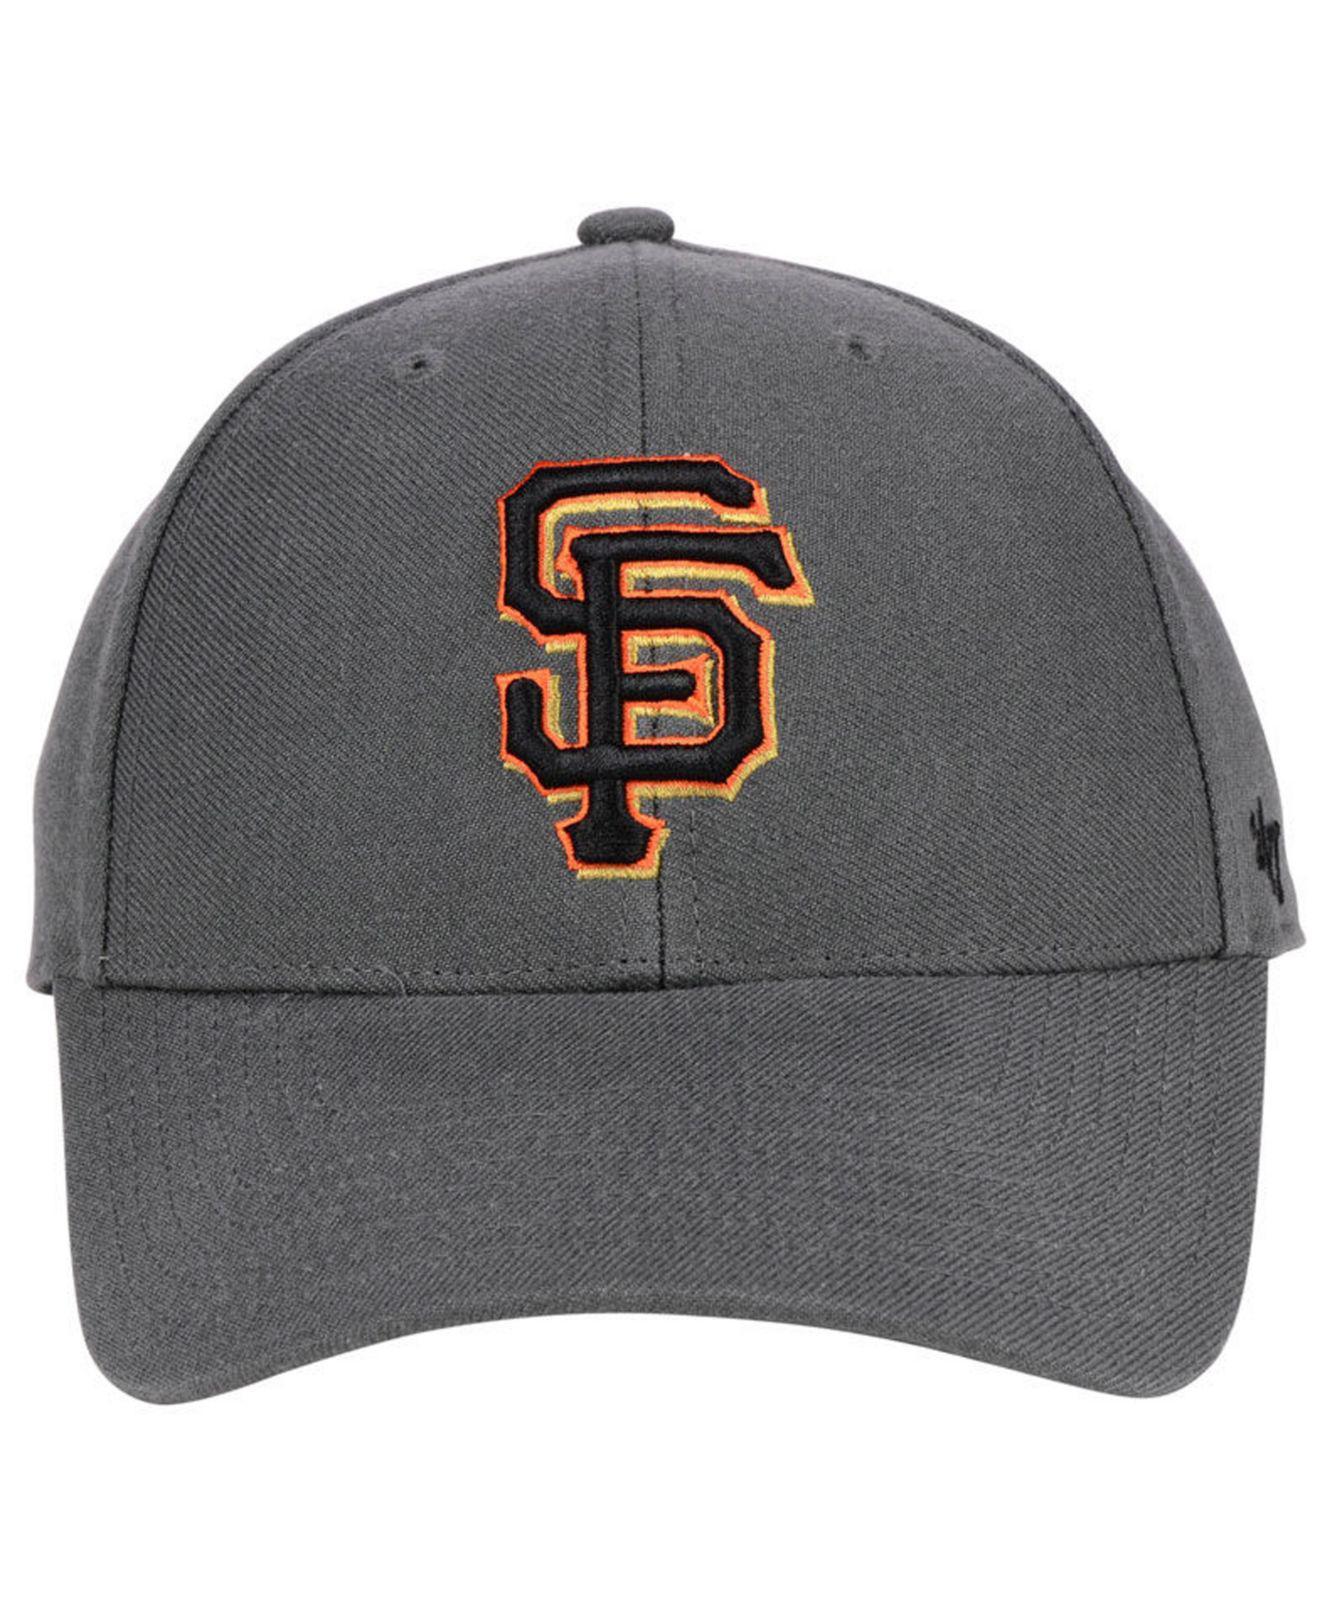 84fbb5398 Lyst - 47 Brand San Francisco Giants Charcoal Mvp Cap in Gray for Men